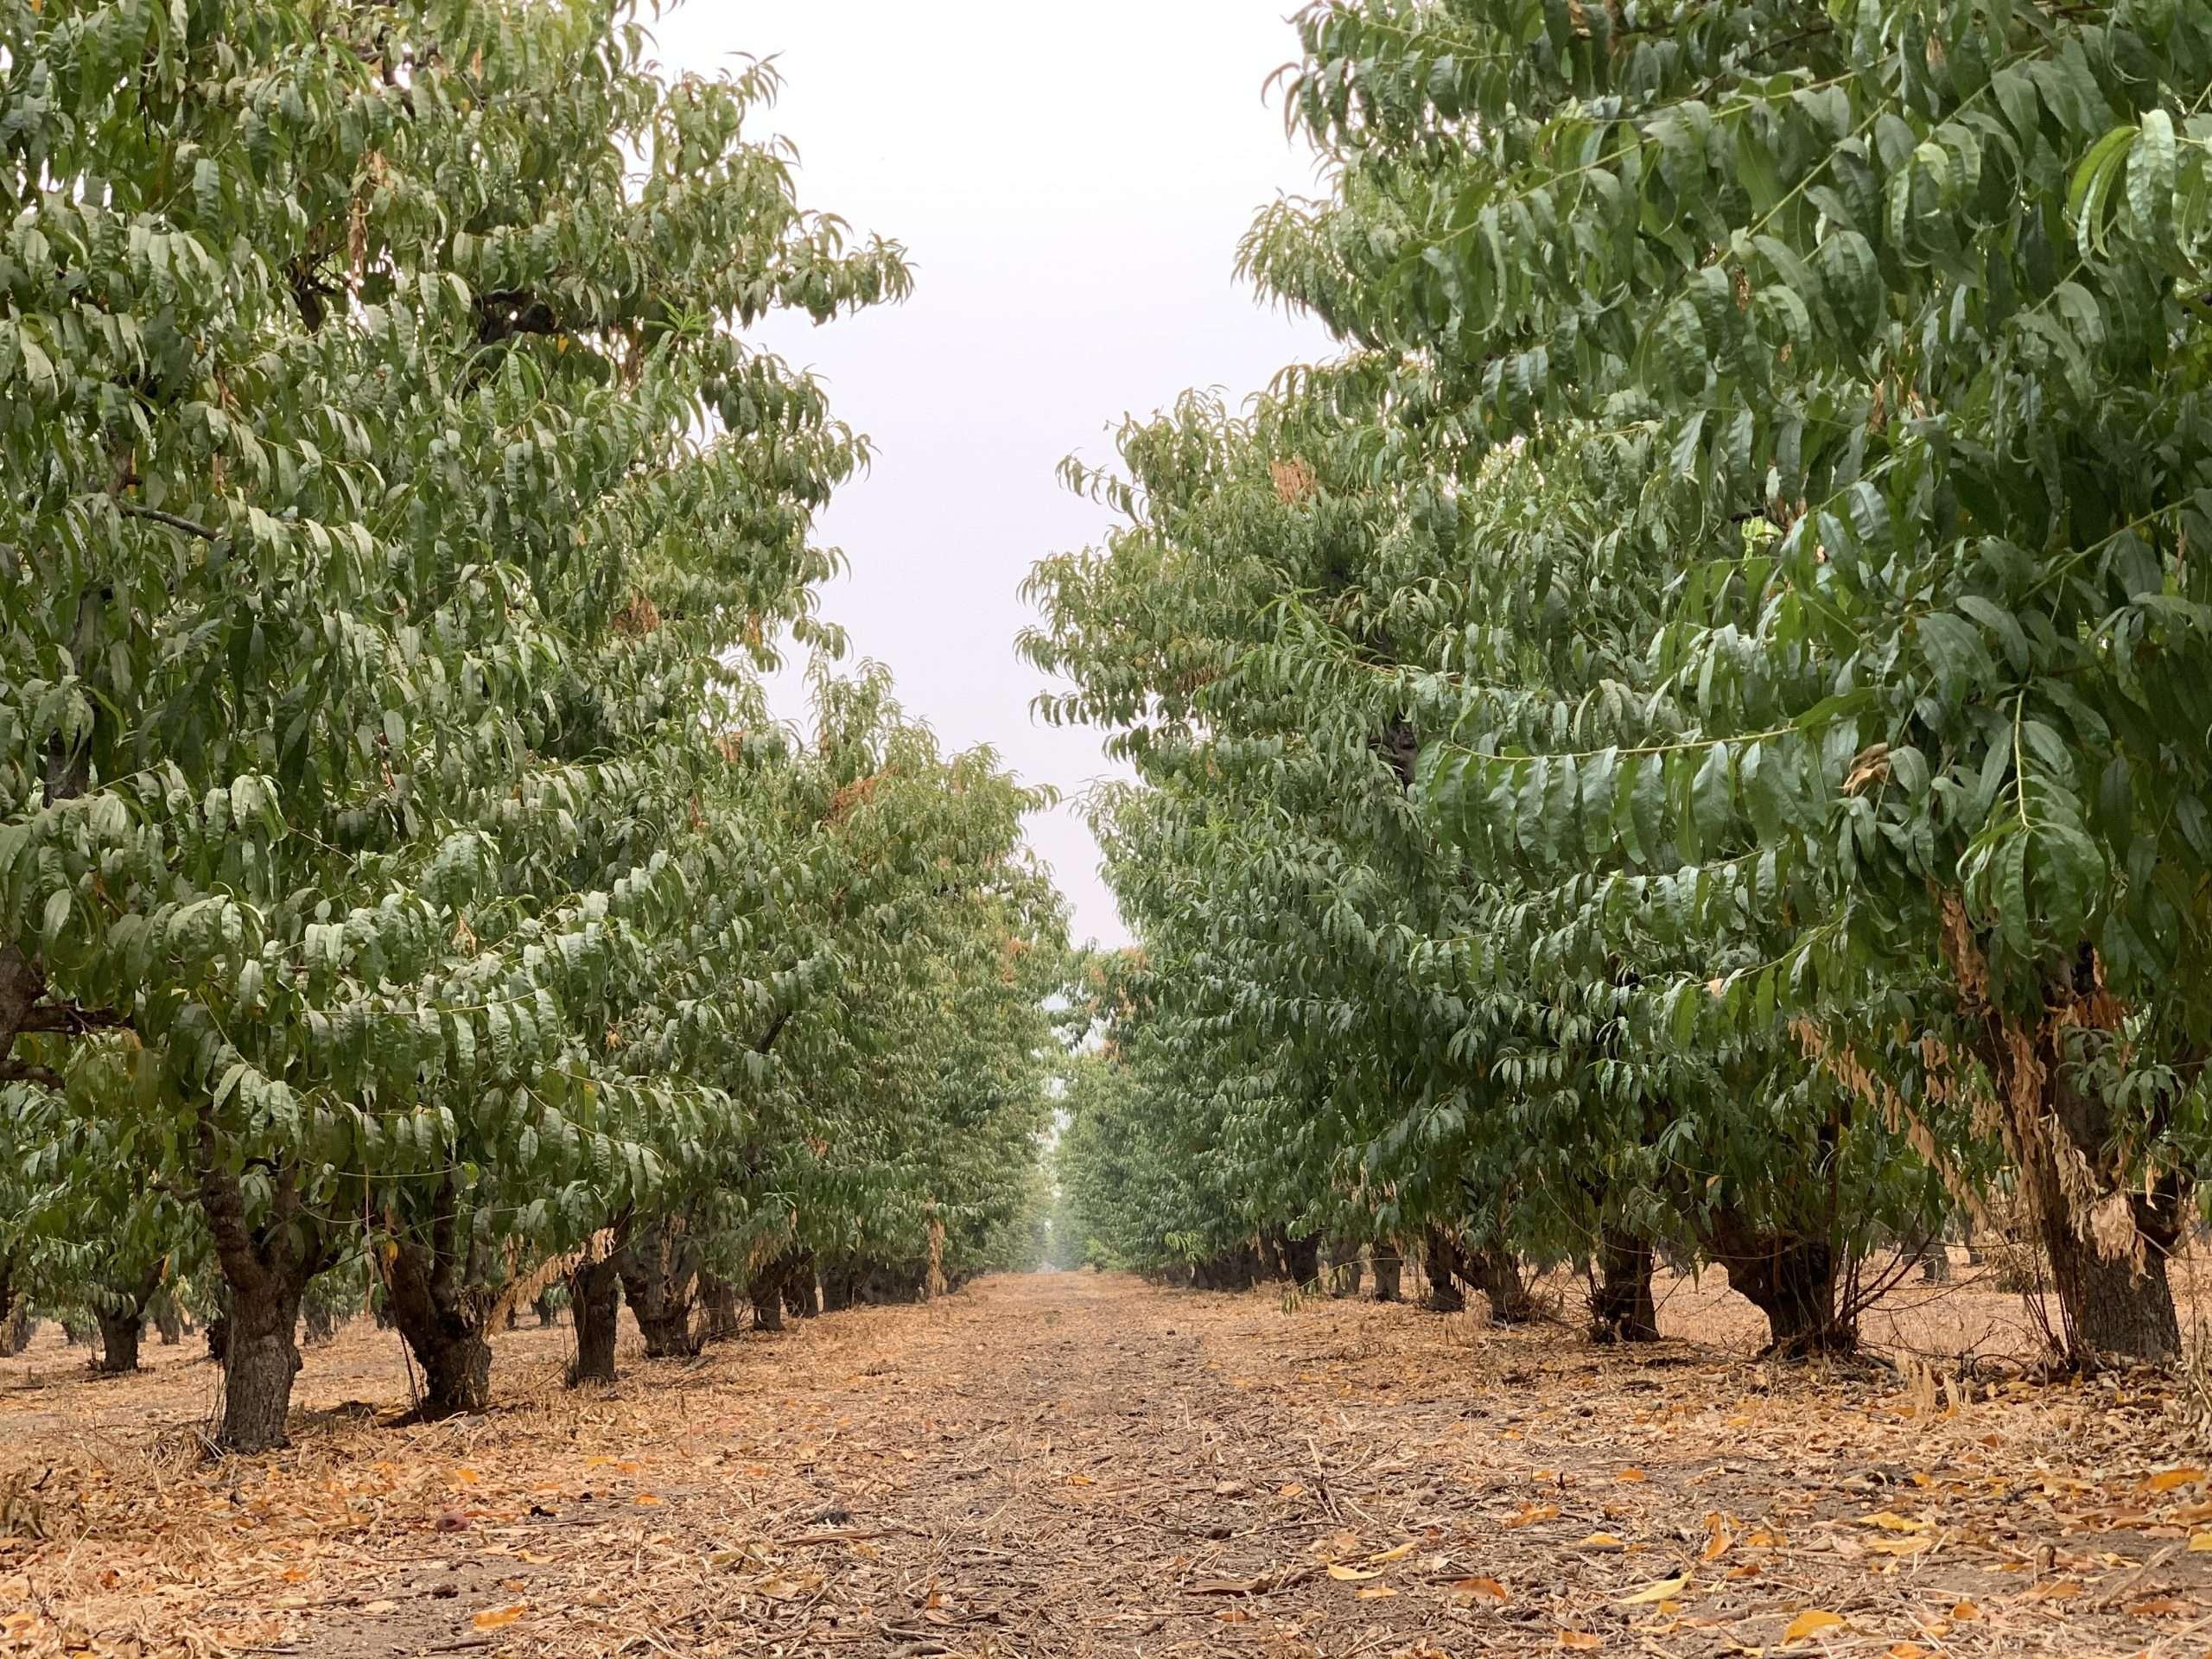 56 Acres Peaches and Open Ground, Orange Cove, CA